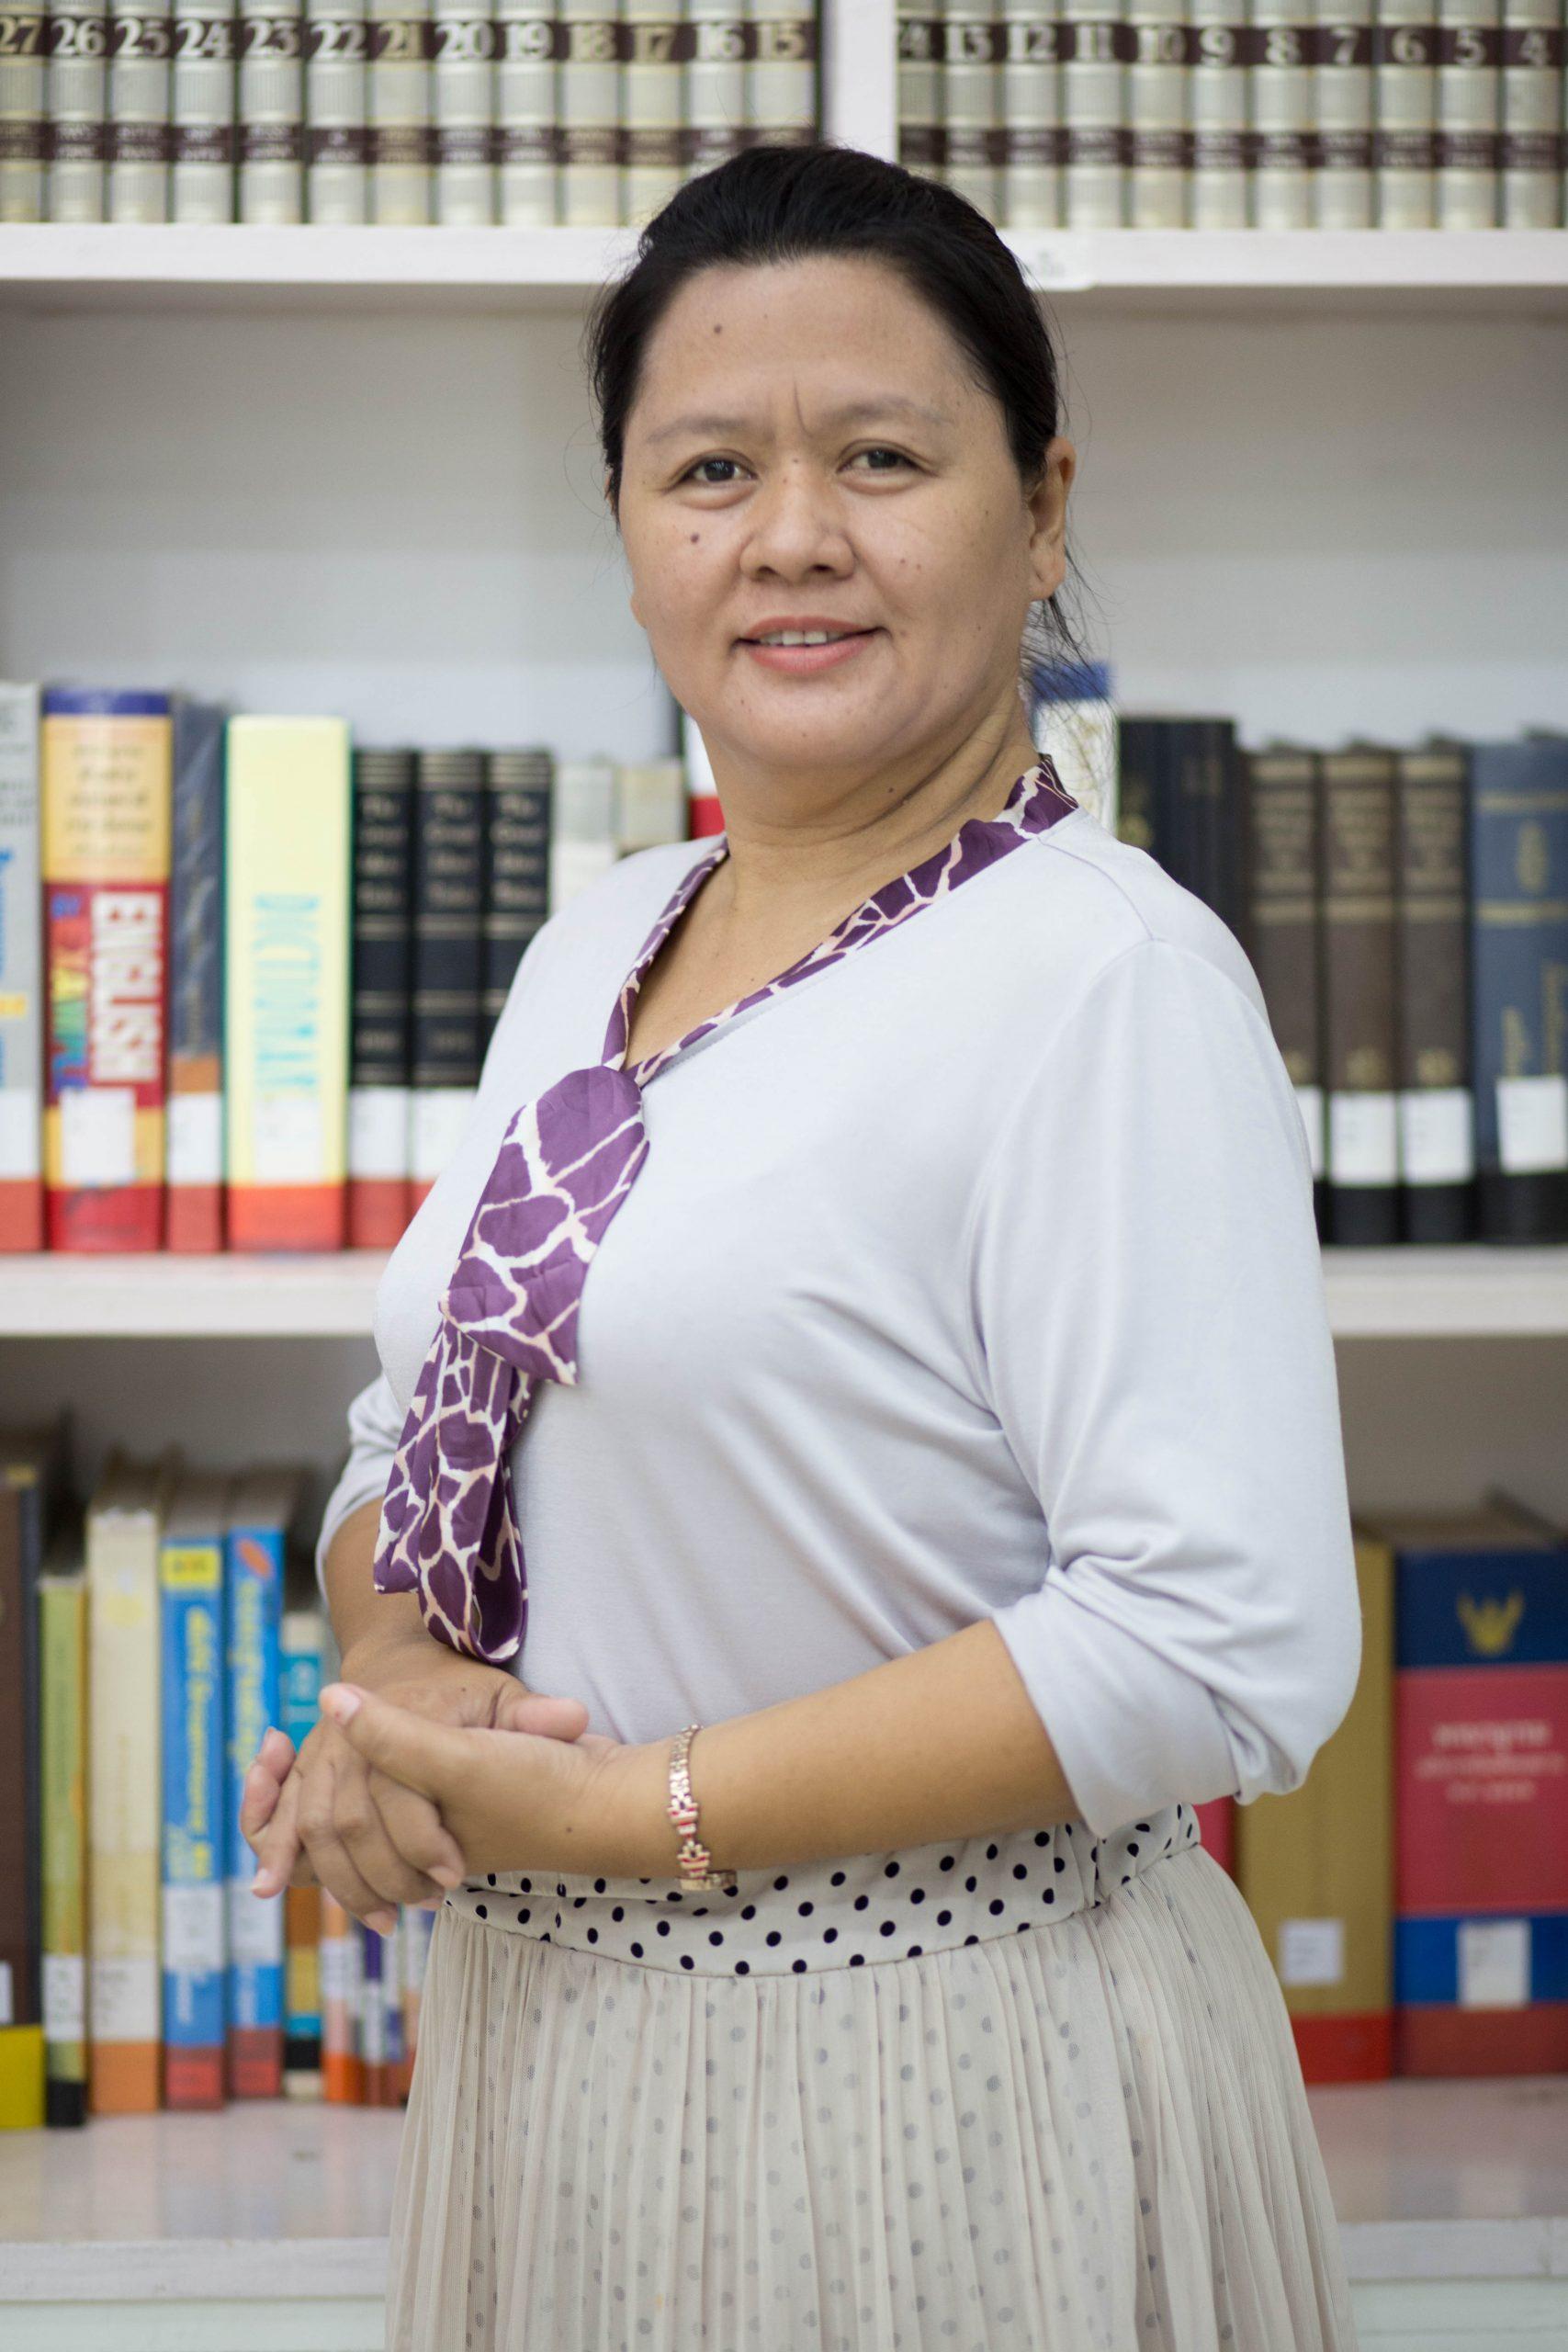 Miss.Anafe Senorin Lamboloto